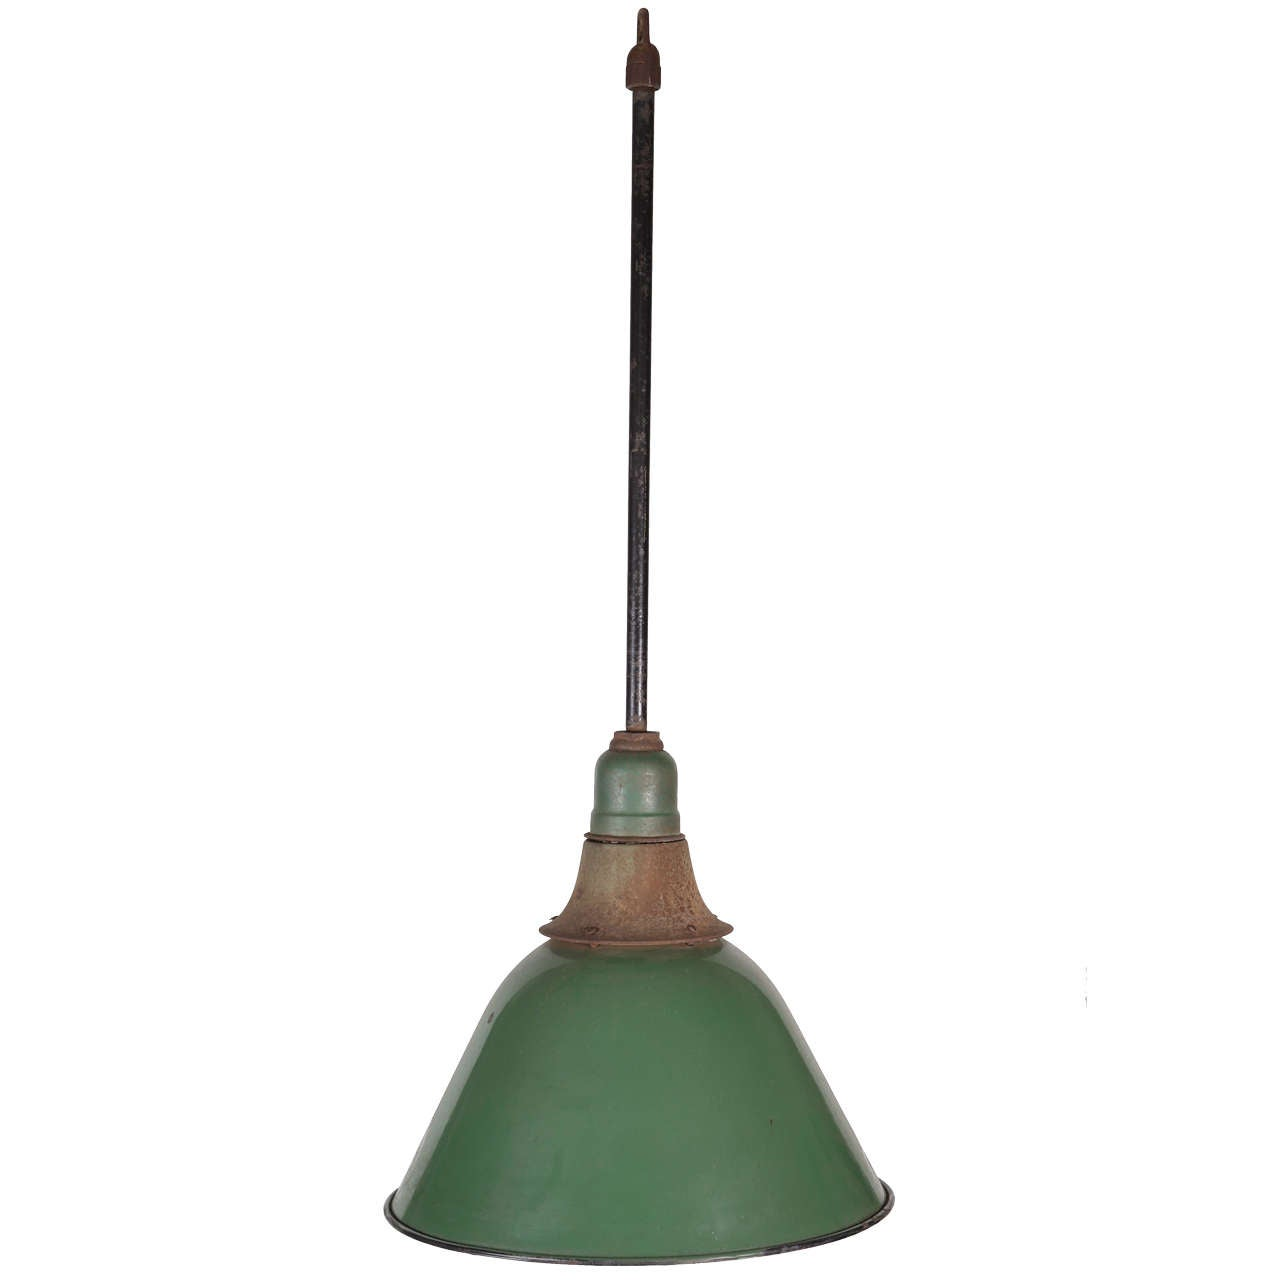 Green Enamel Bell Shaped Warehouse Light For Sale